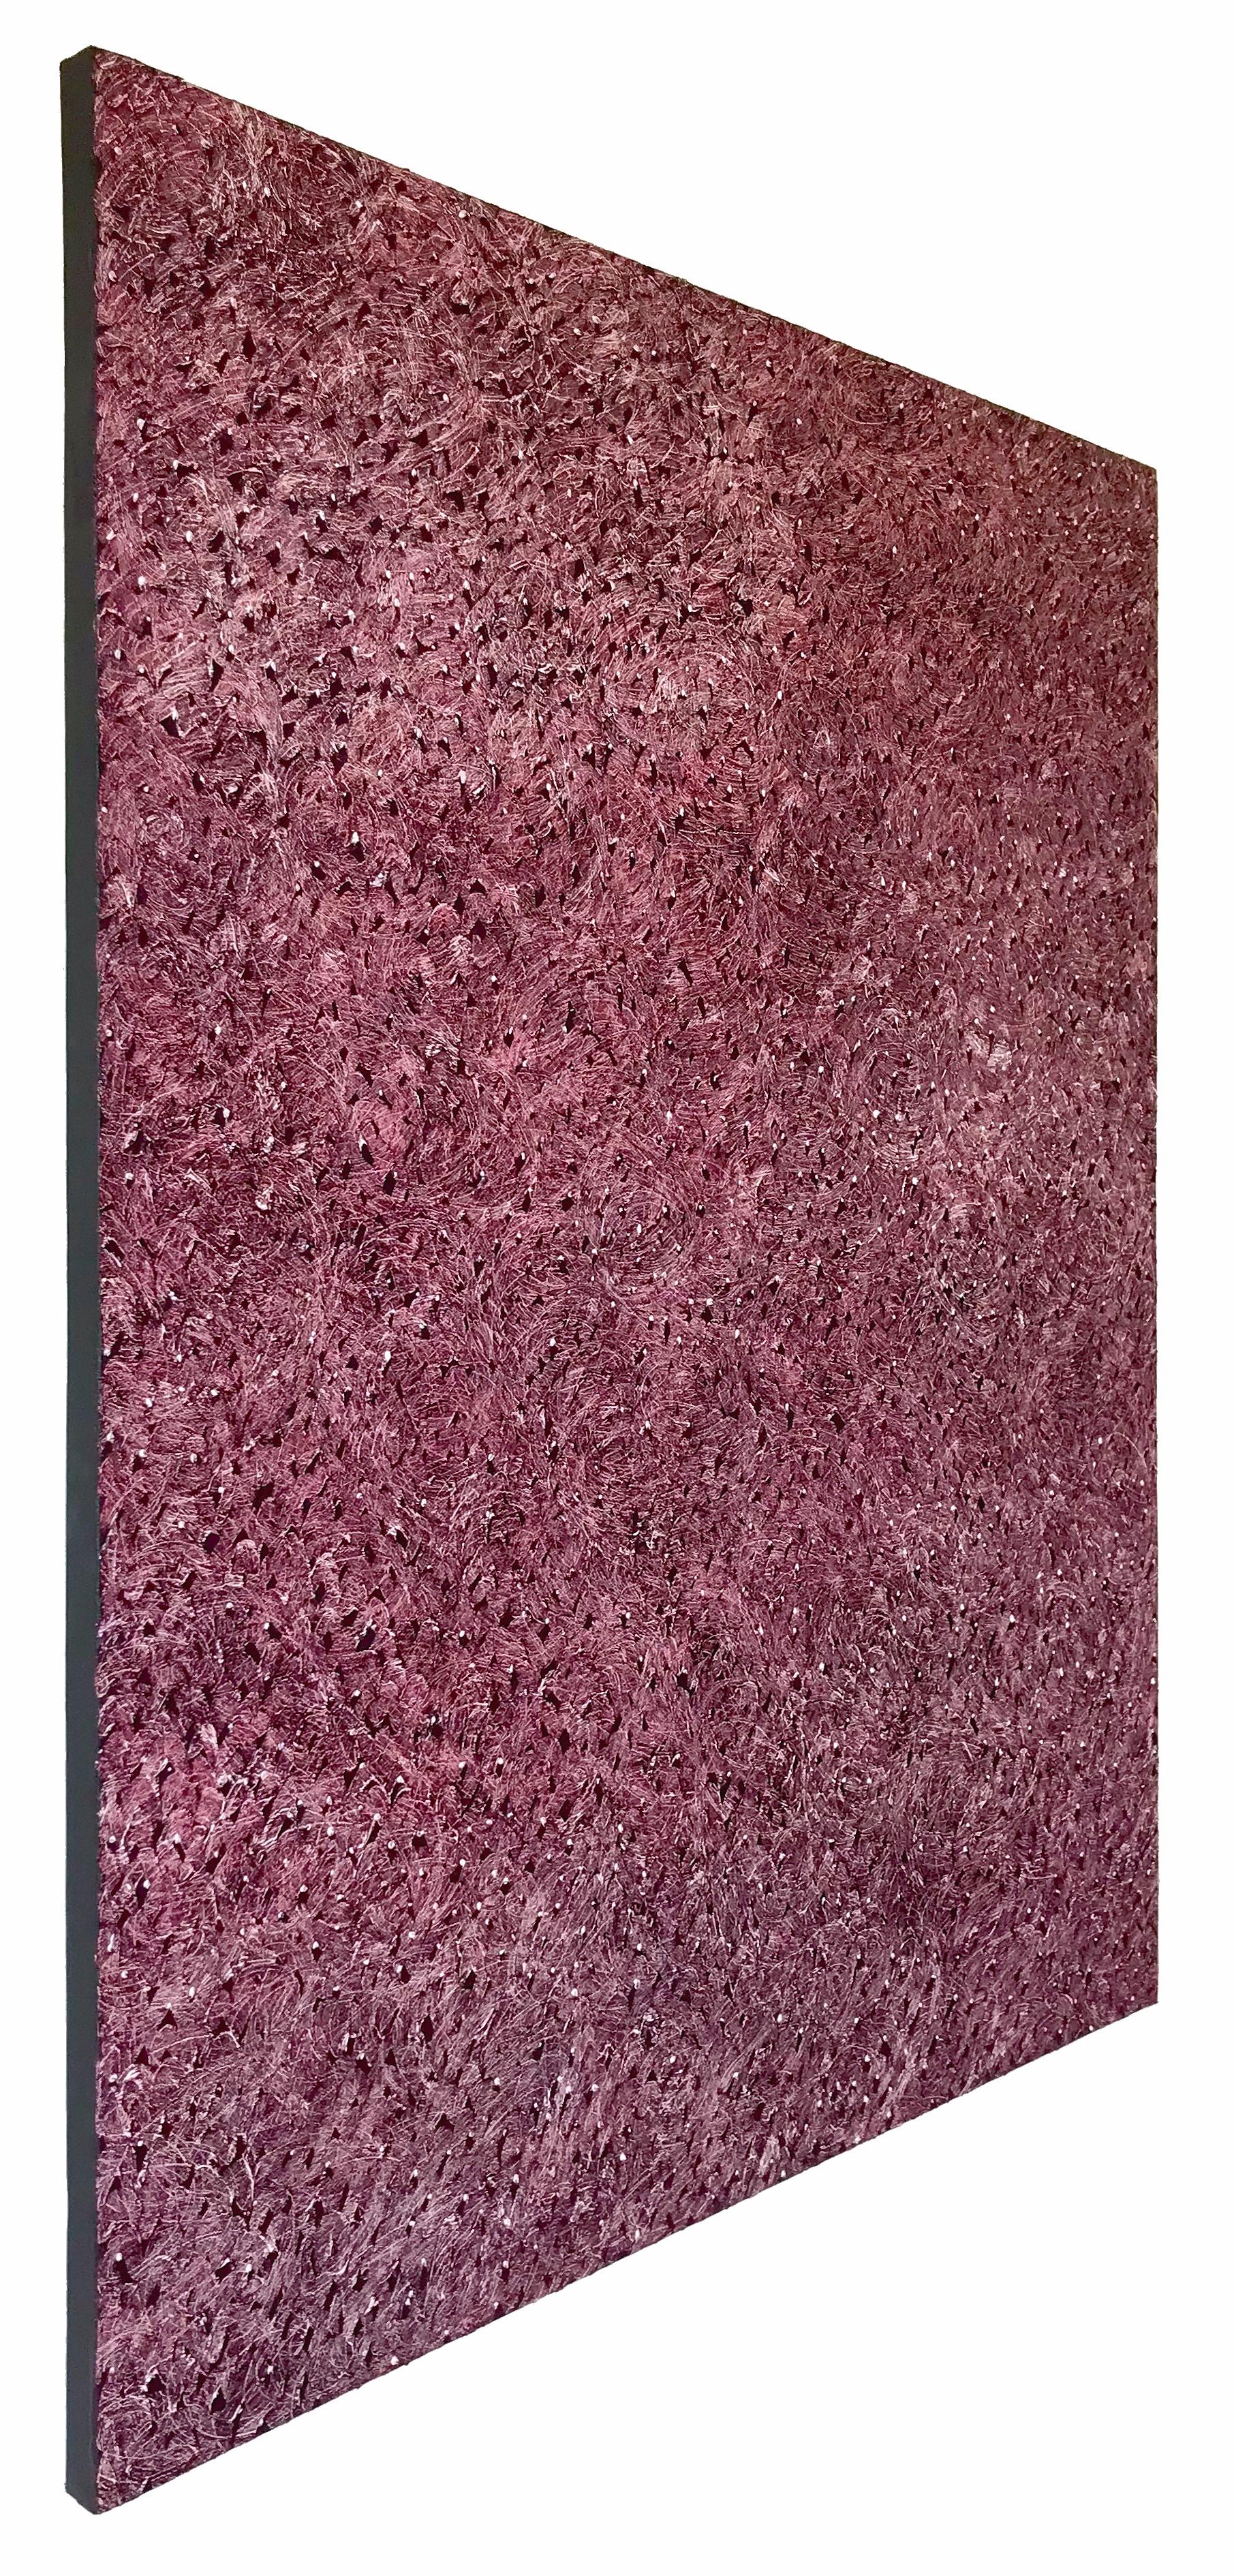 Soft Circles - Oil on Cotton Canvas50x75cm